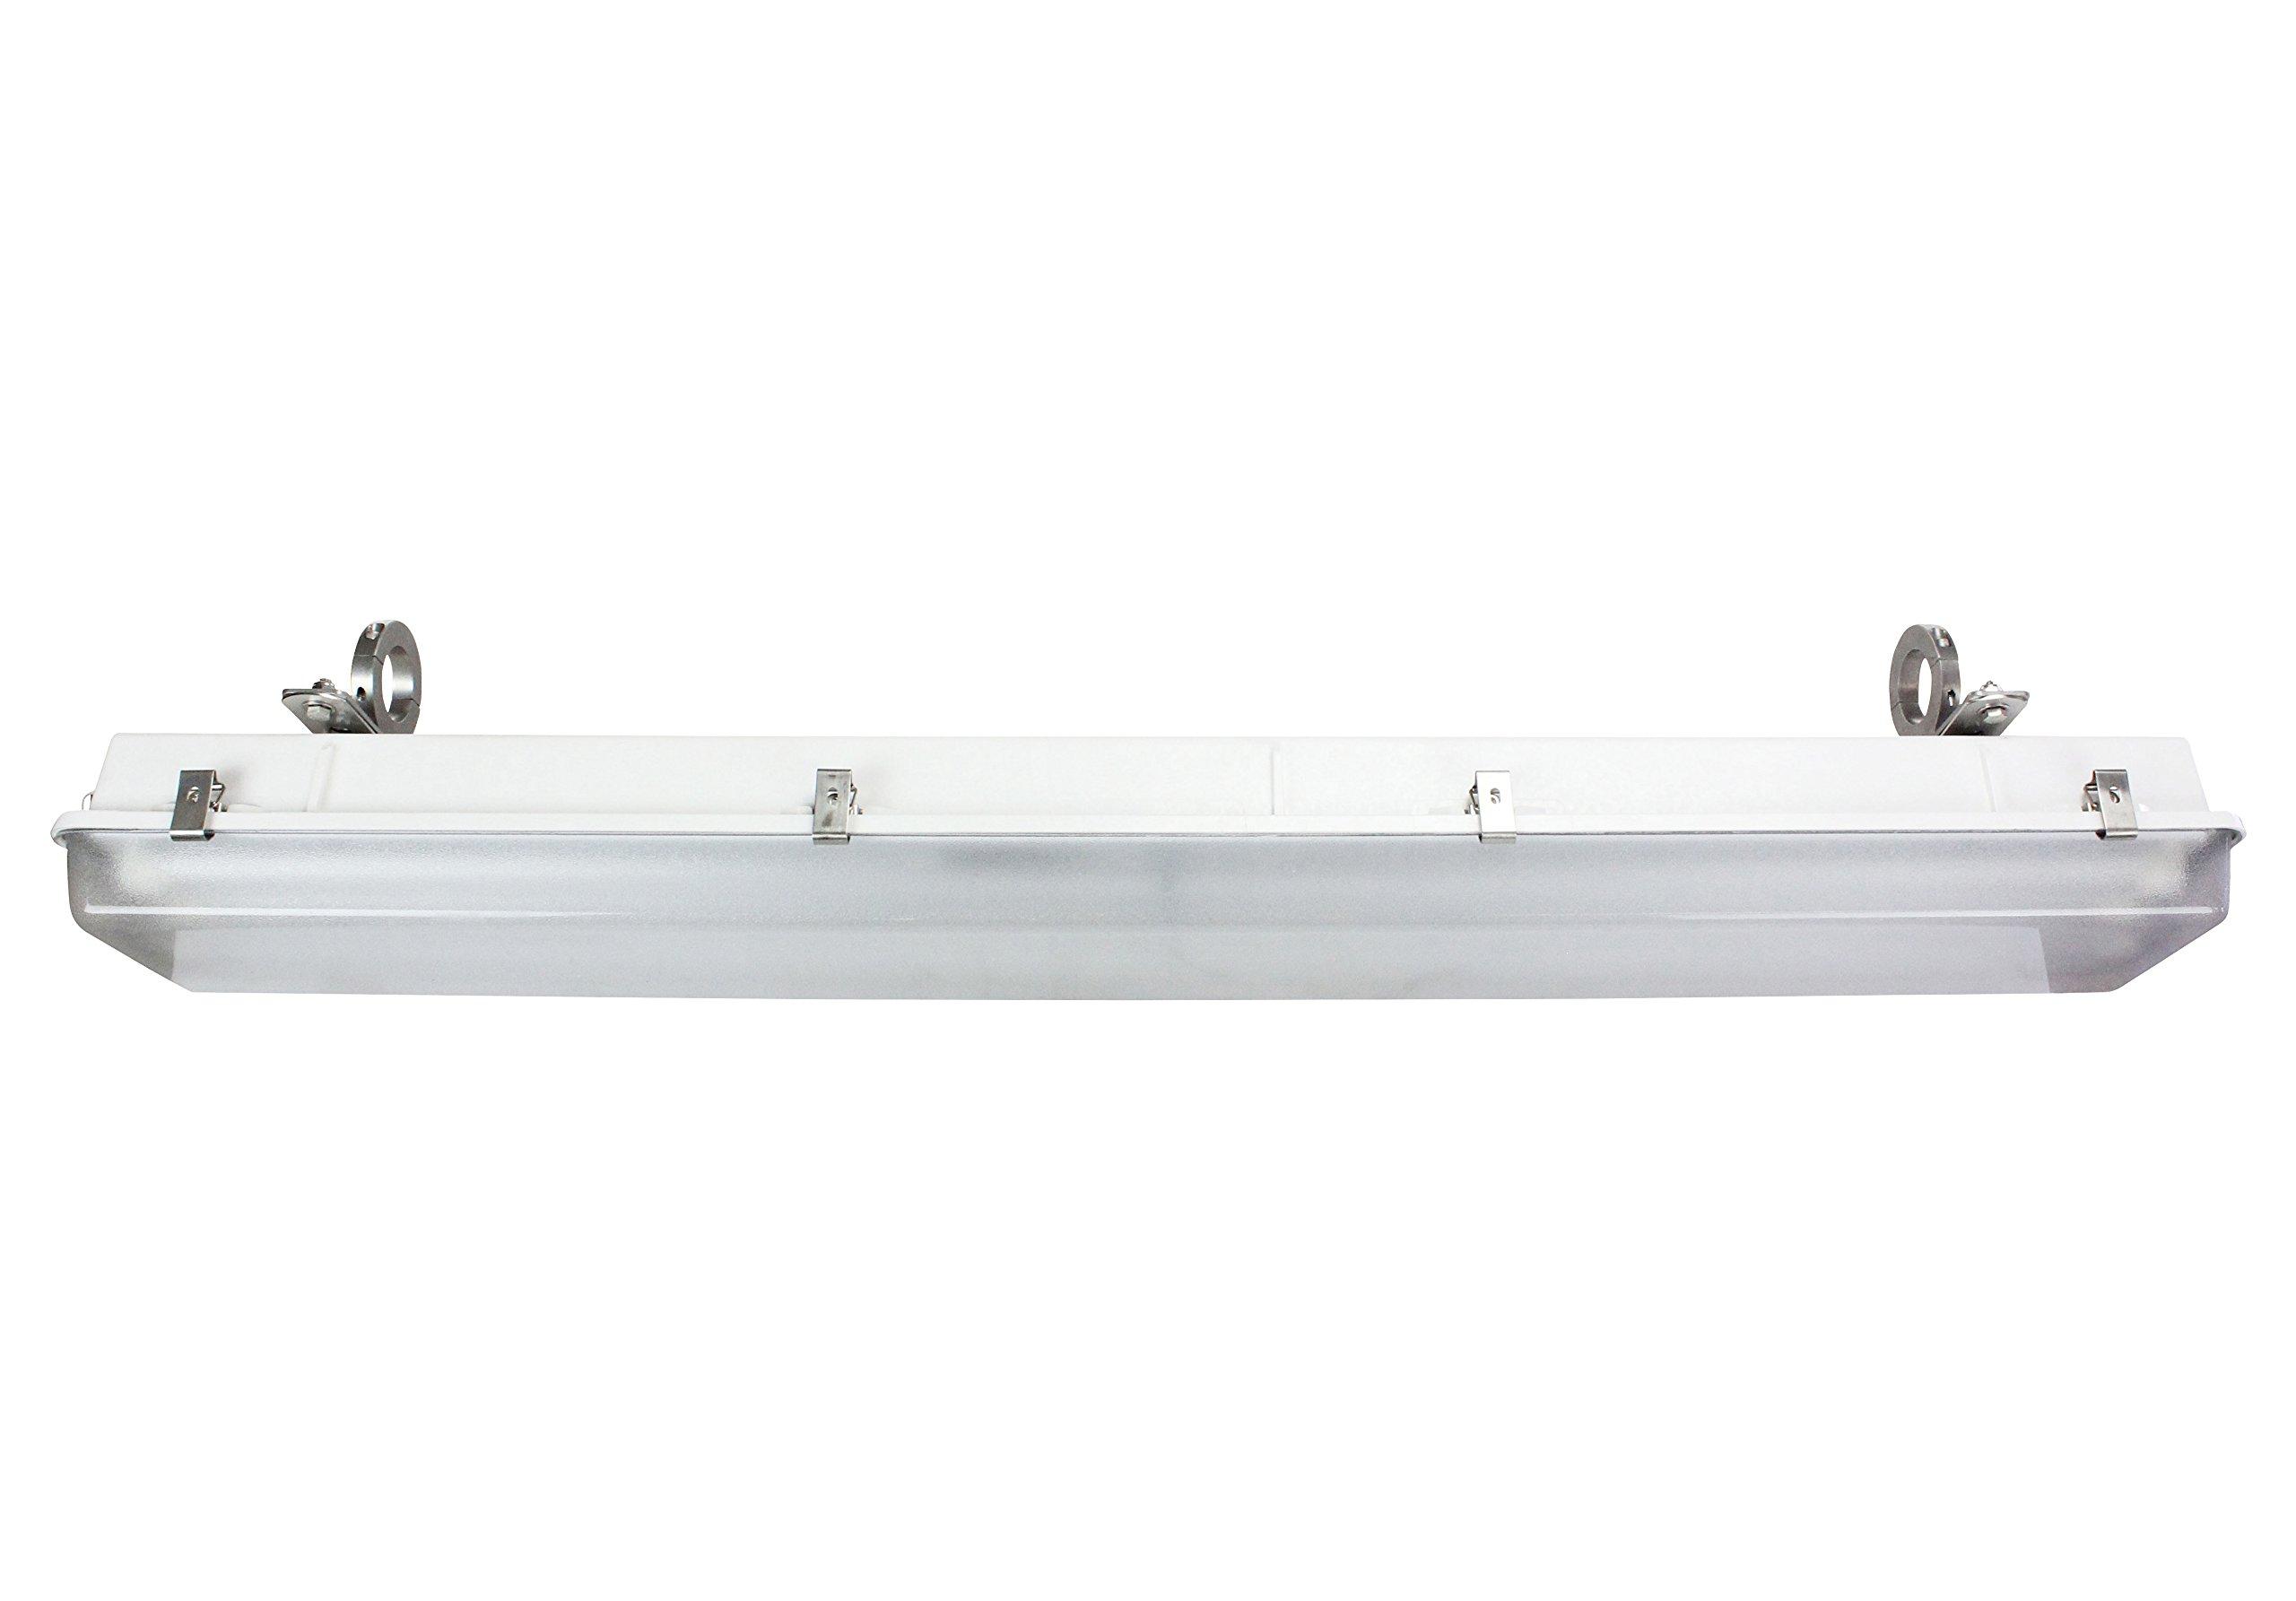 Corrosion Resistant Fluorescent Light Fixture - 2'' Pole Mount Brackets - Stainless Steel Hardware